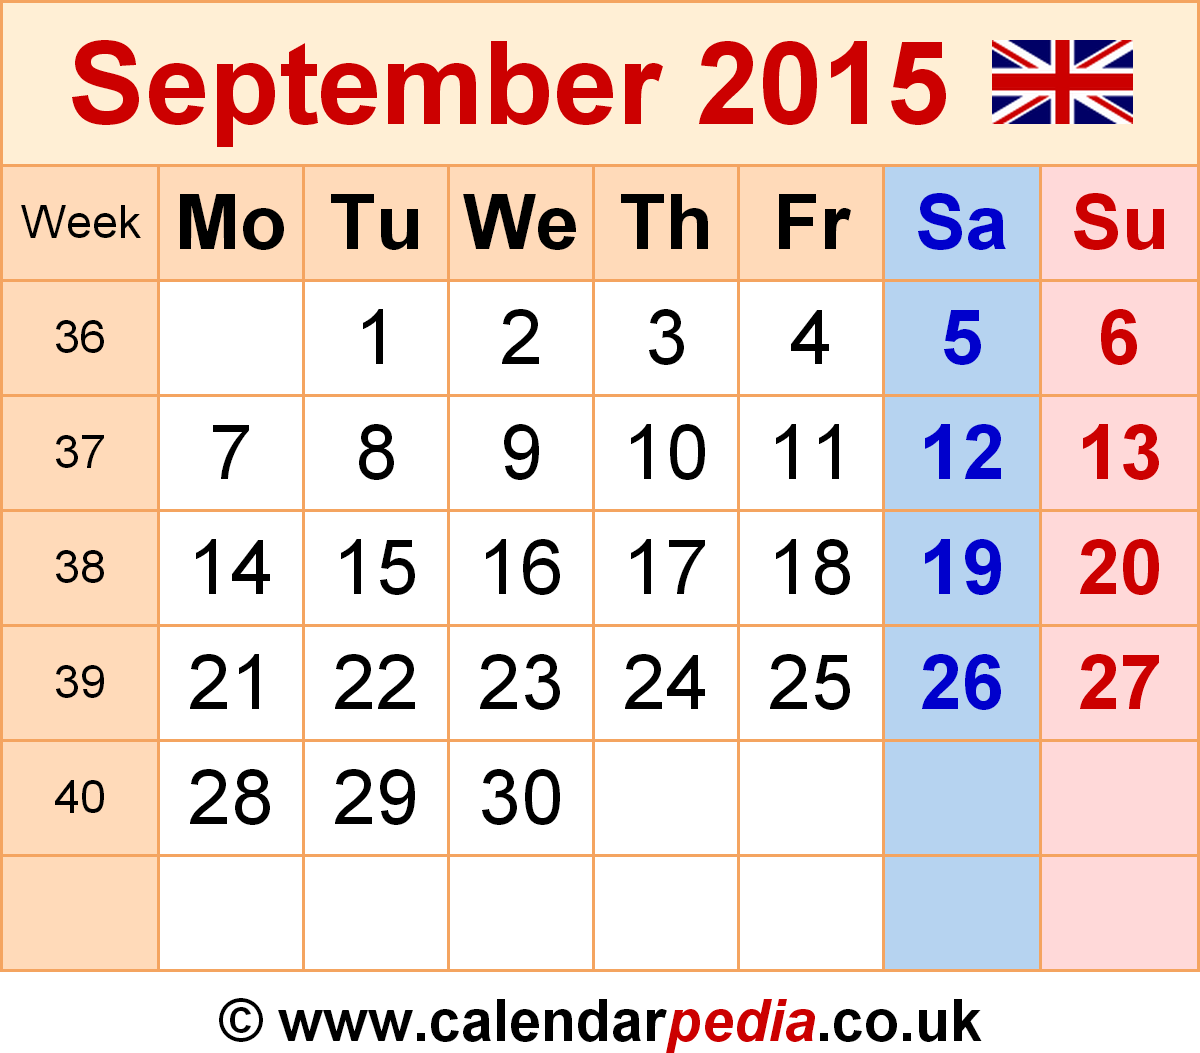 Calendar September 2015 template 6: graphic/image file in PNG format - Calendar PNG September 2015